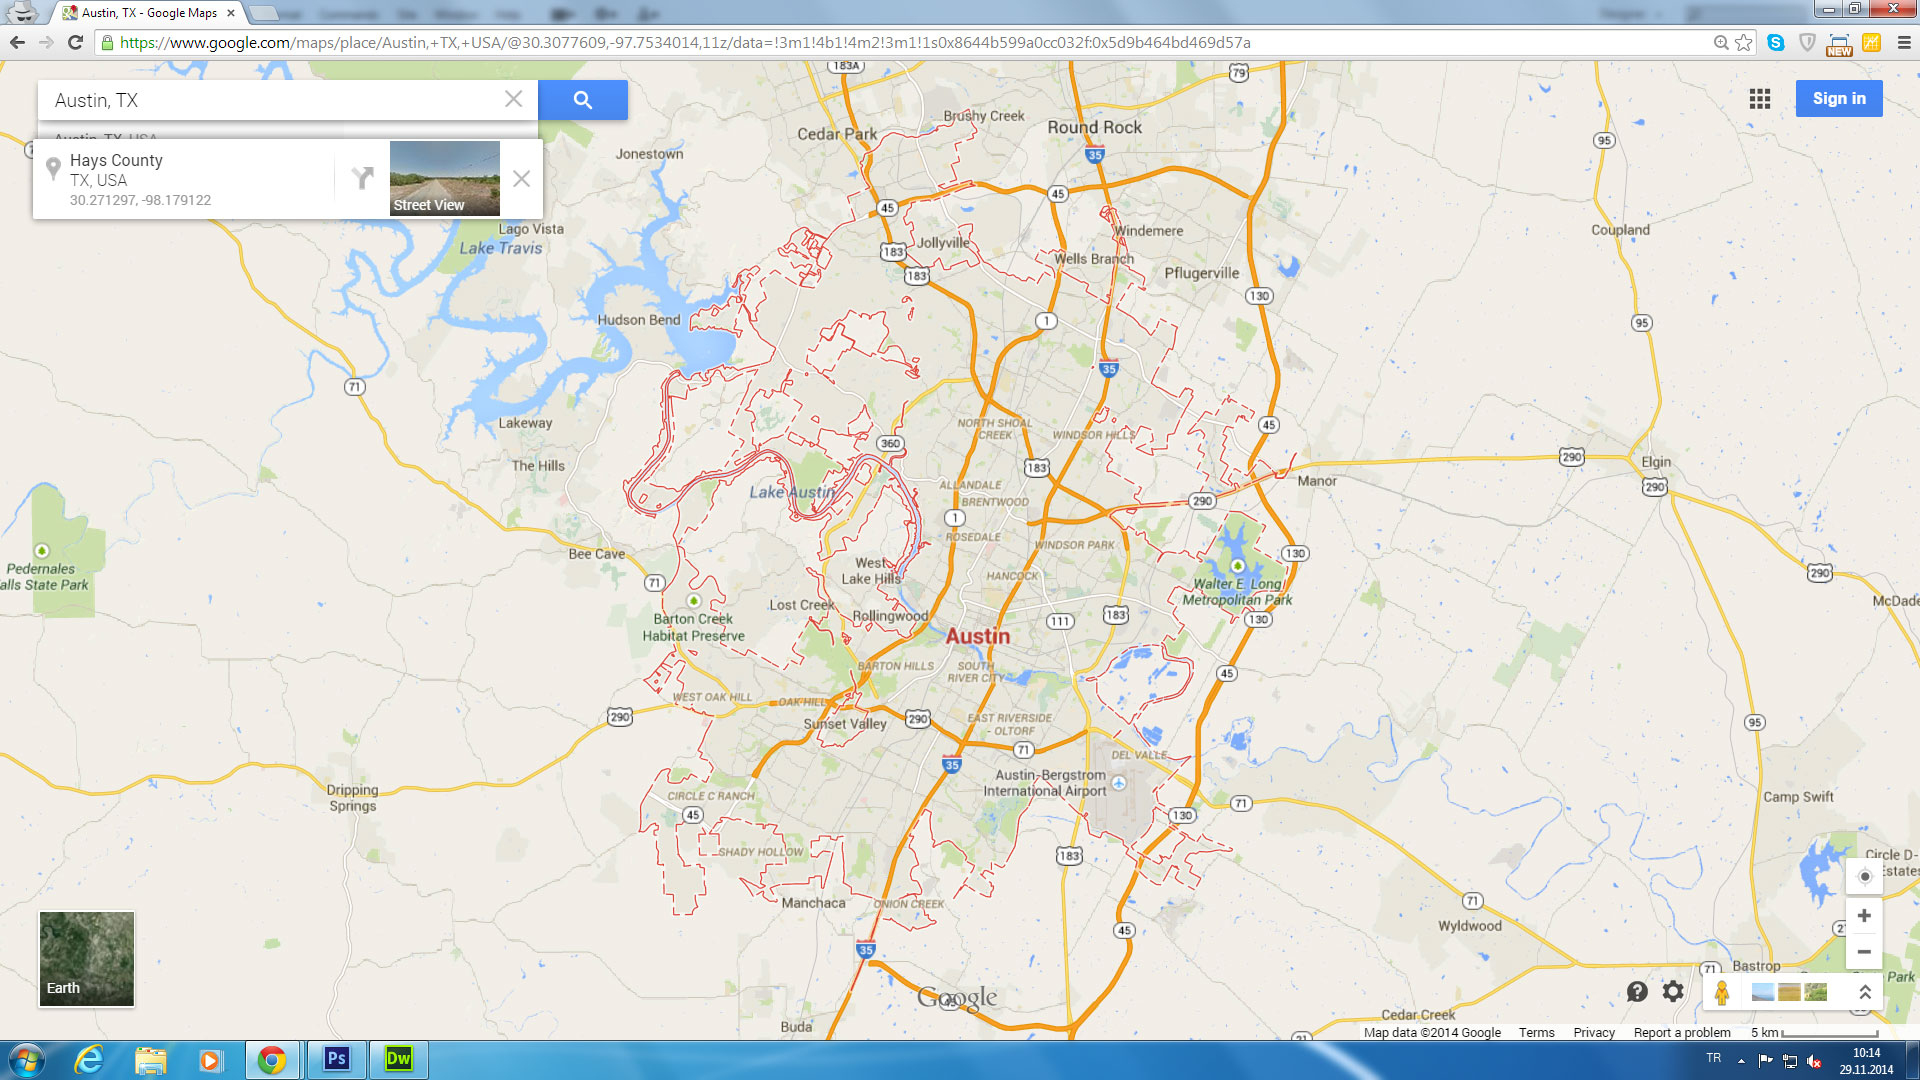 Austin Tx Google Maps #551035 - Austin Texas Google Maps